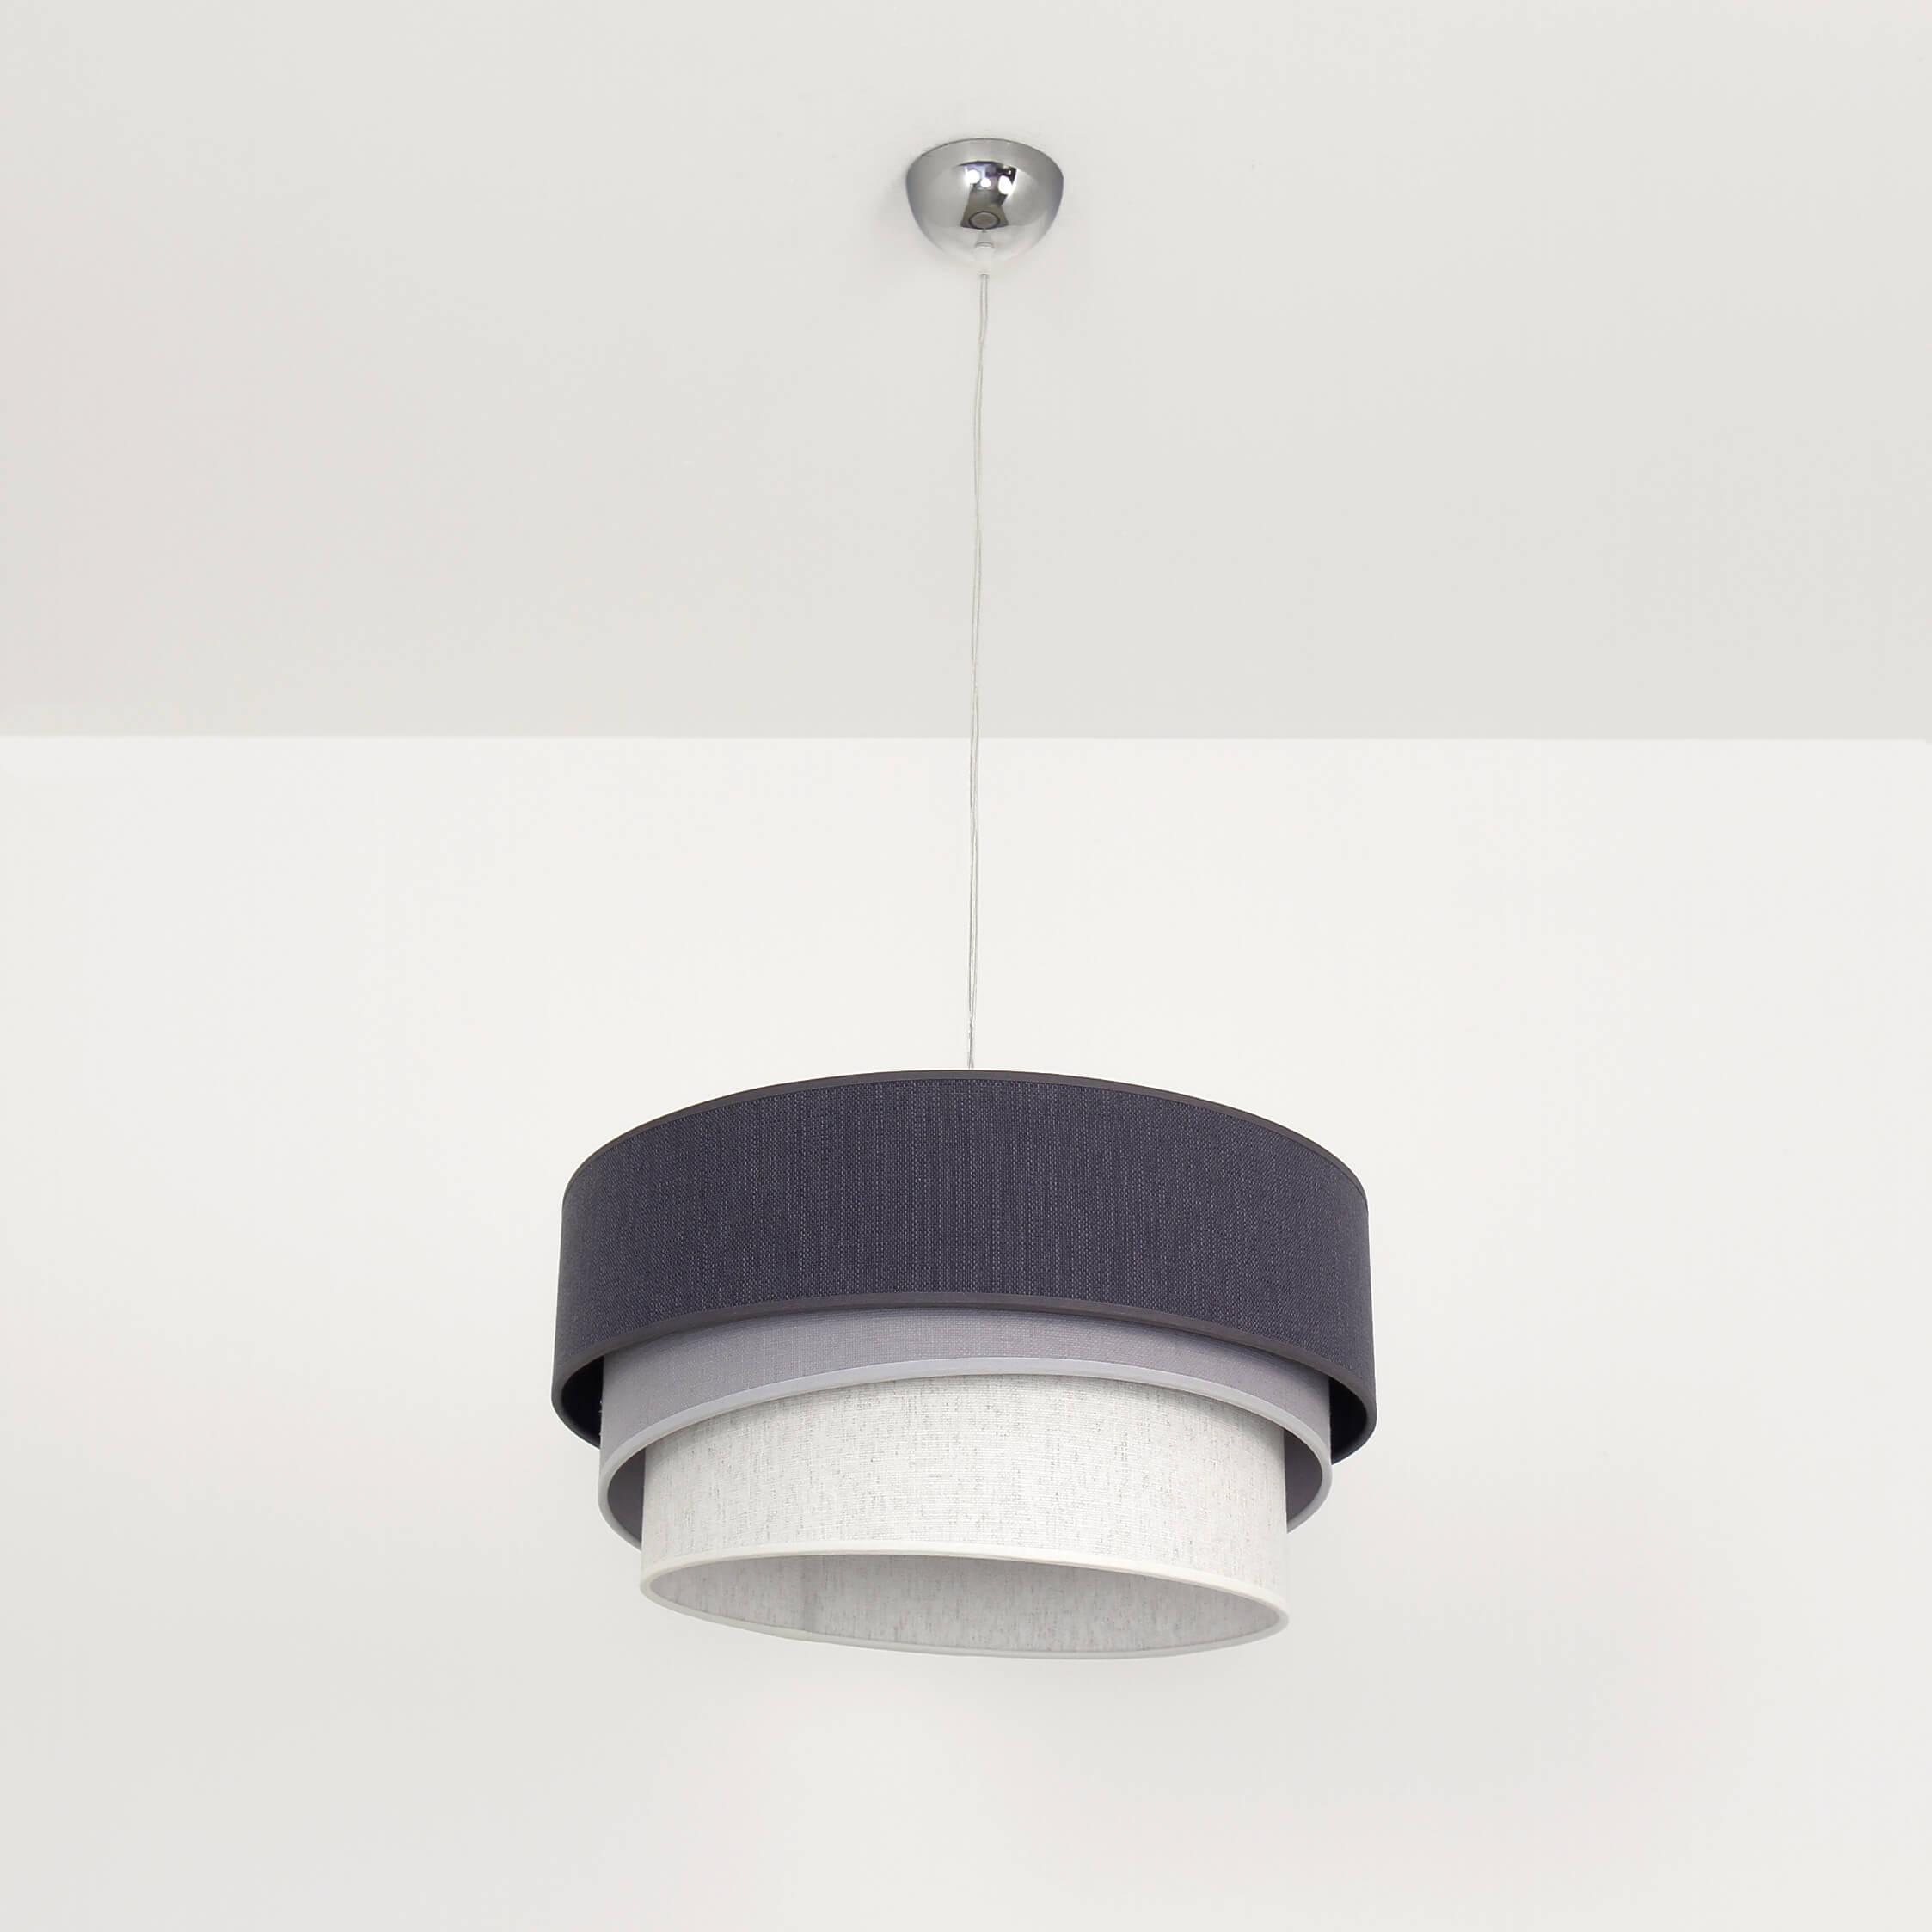 Graue Pendelleuchte Stoff Ø45cm modernes Design